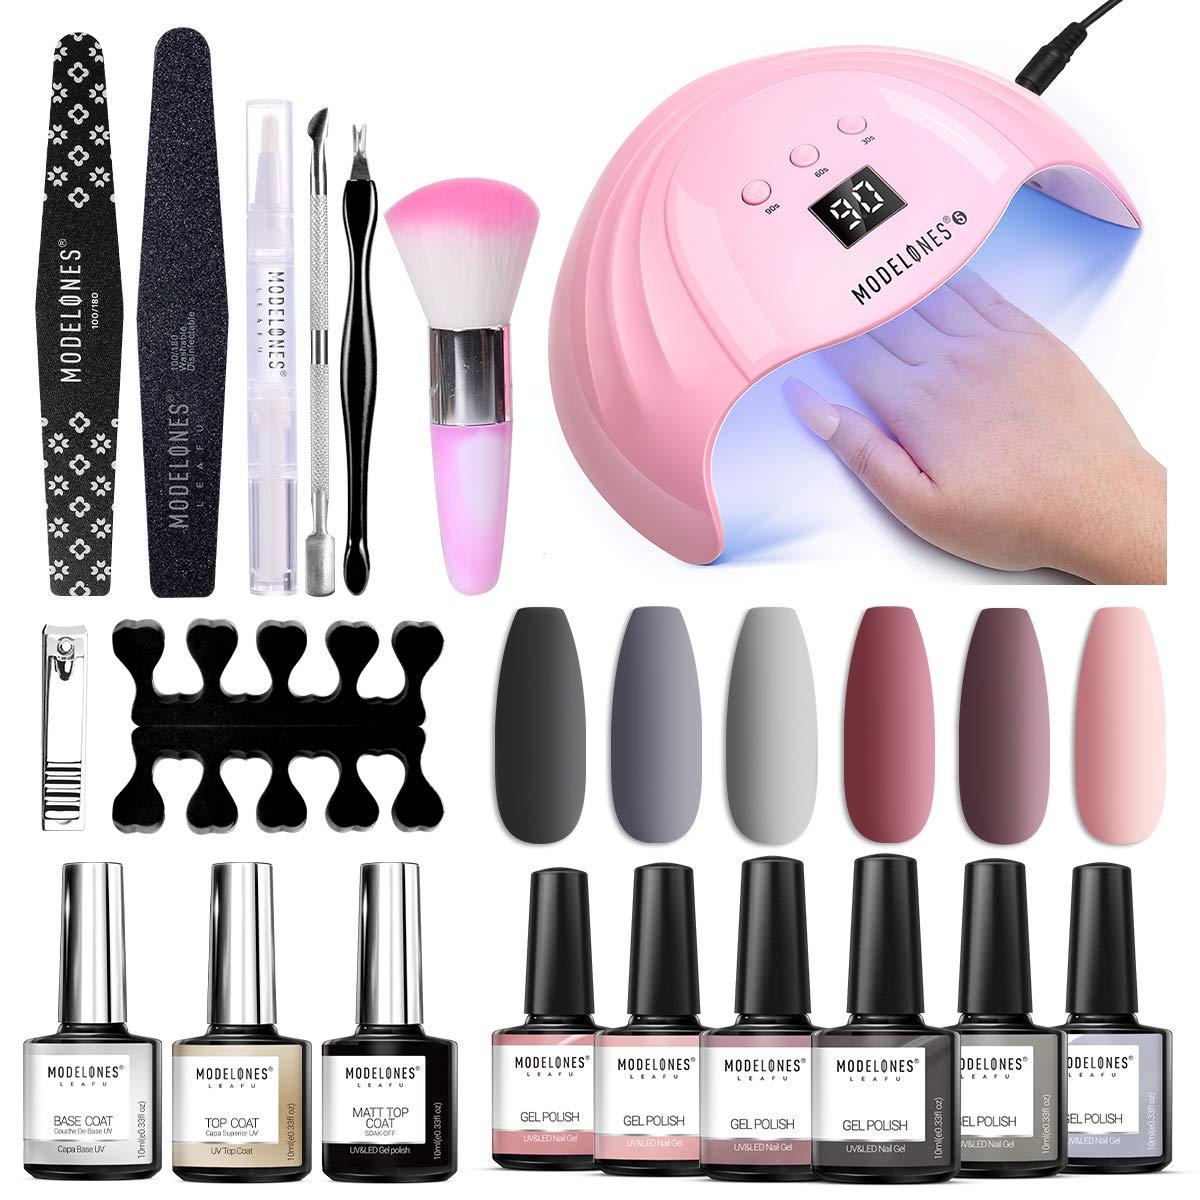 Gel Nail Polish Kit Modelones Gel Nail Polish Kit with U V light 48W Nail Lamp 6 Nude Grey Pink Gel Nail Polish Set, Matte Gel Top Coat, Gel Base and Top Coat(0.34 fl.oz each), Gel Manicure Nail Tools : Beauty